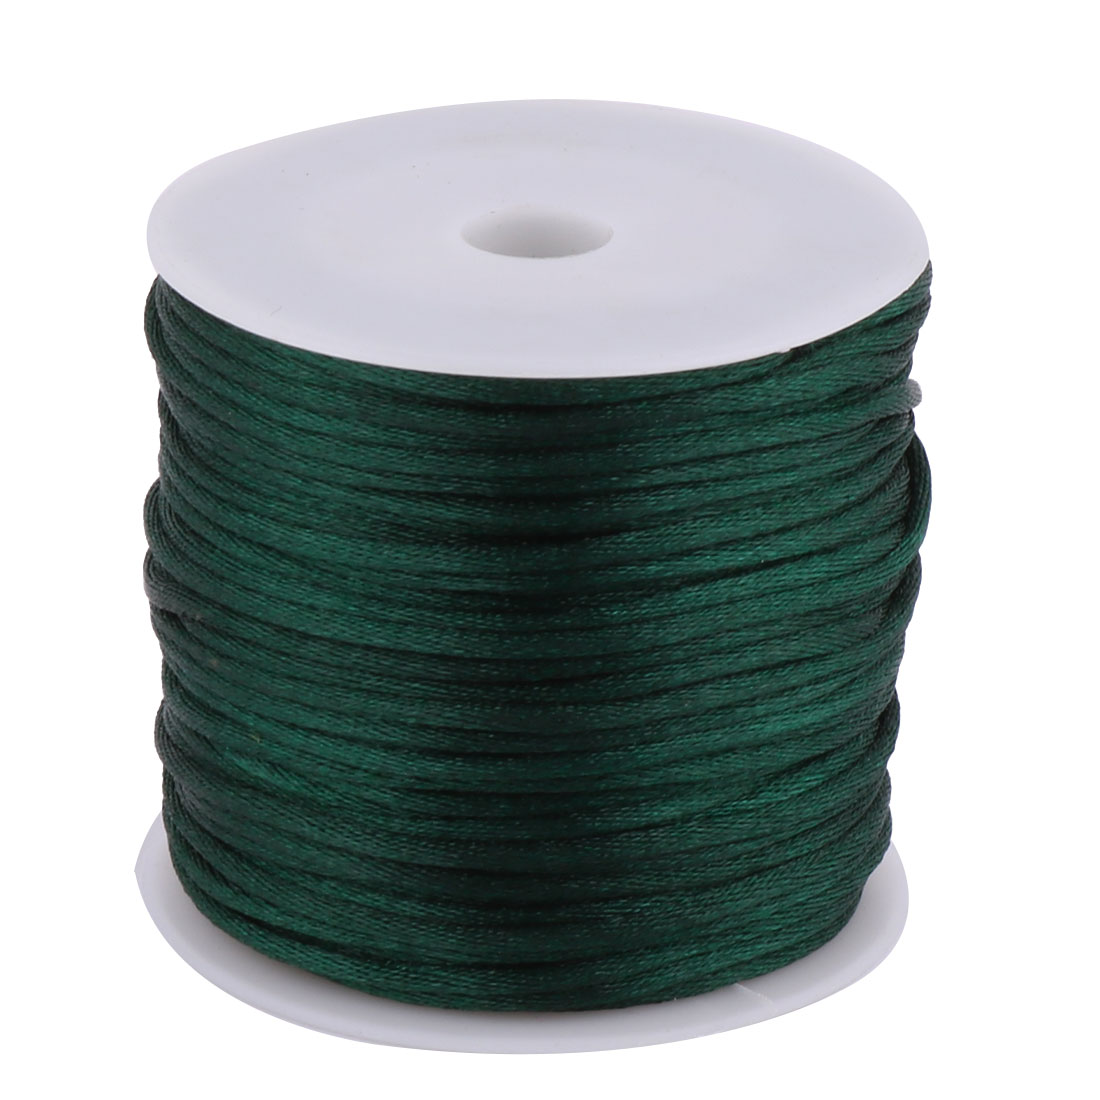 Nylon Handicraft Braided Adornment Chinese Knot String Green 2mm Dia 49 Yards